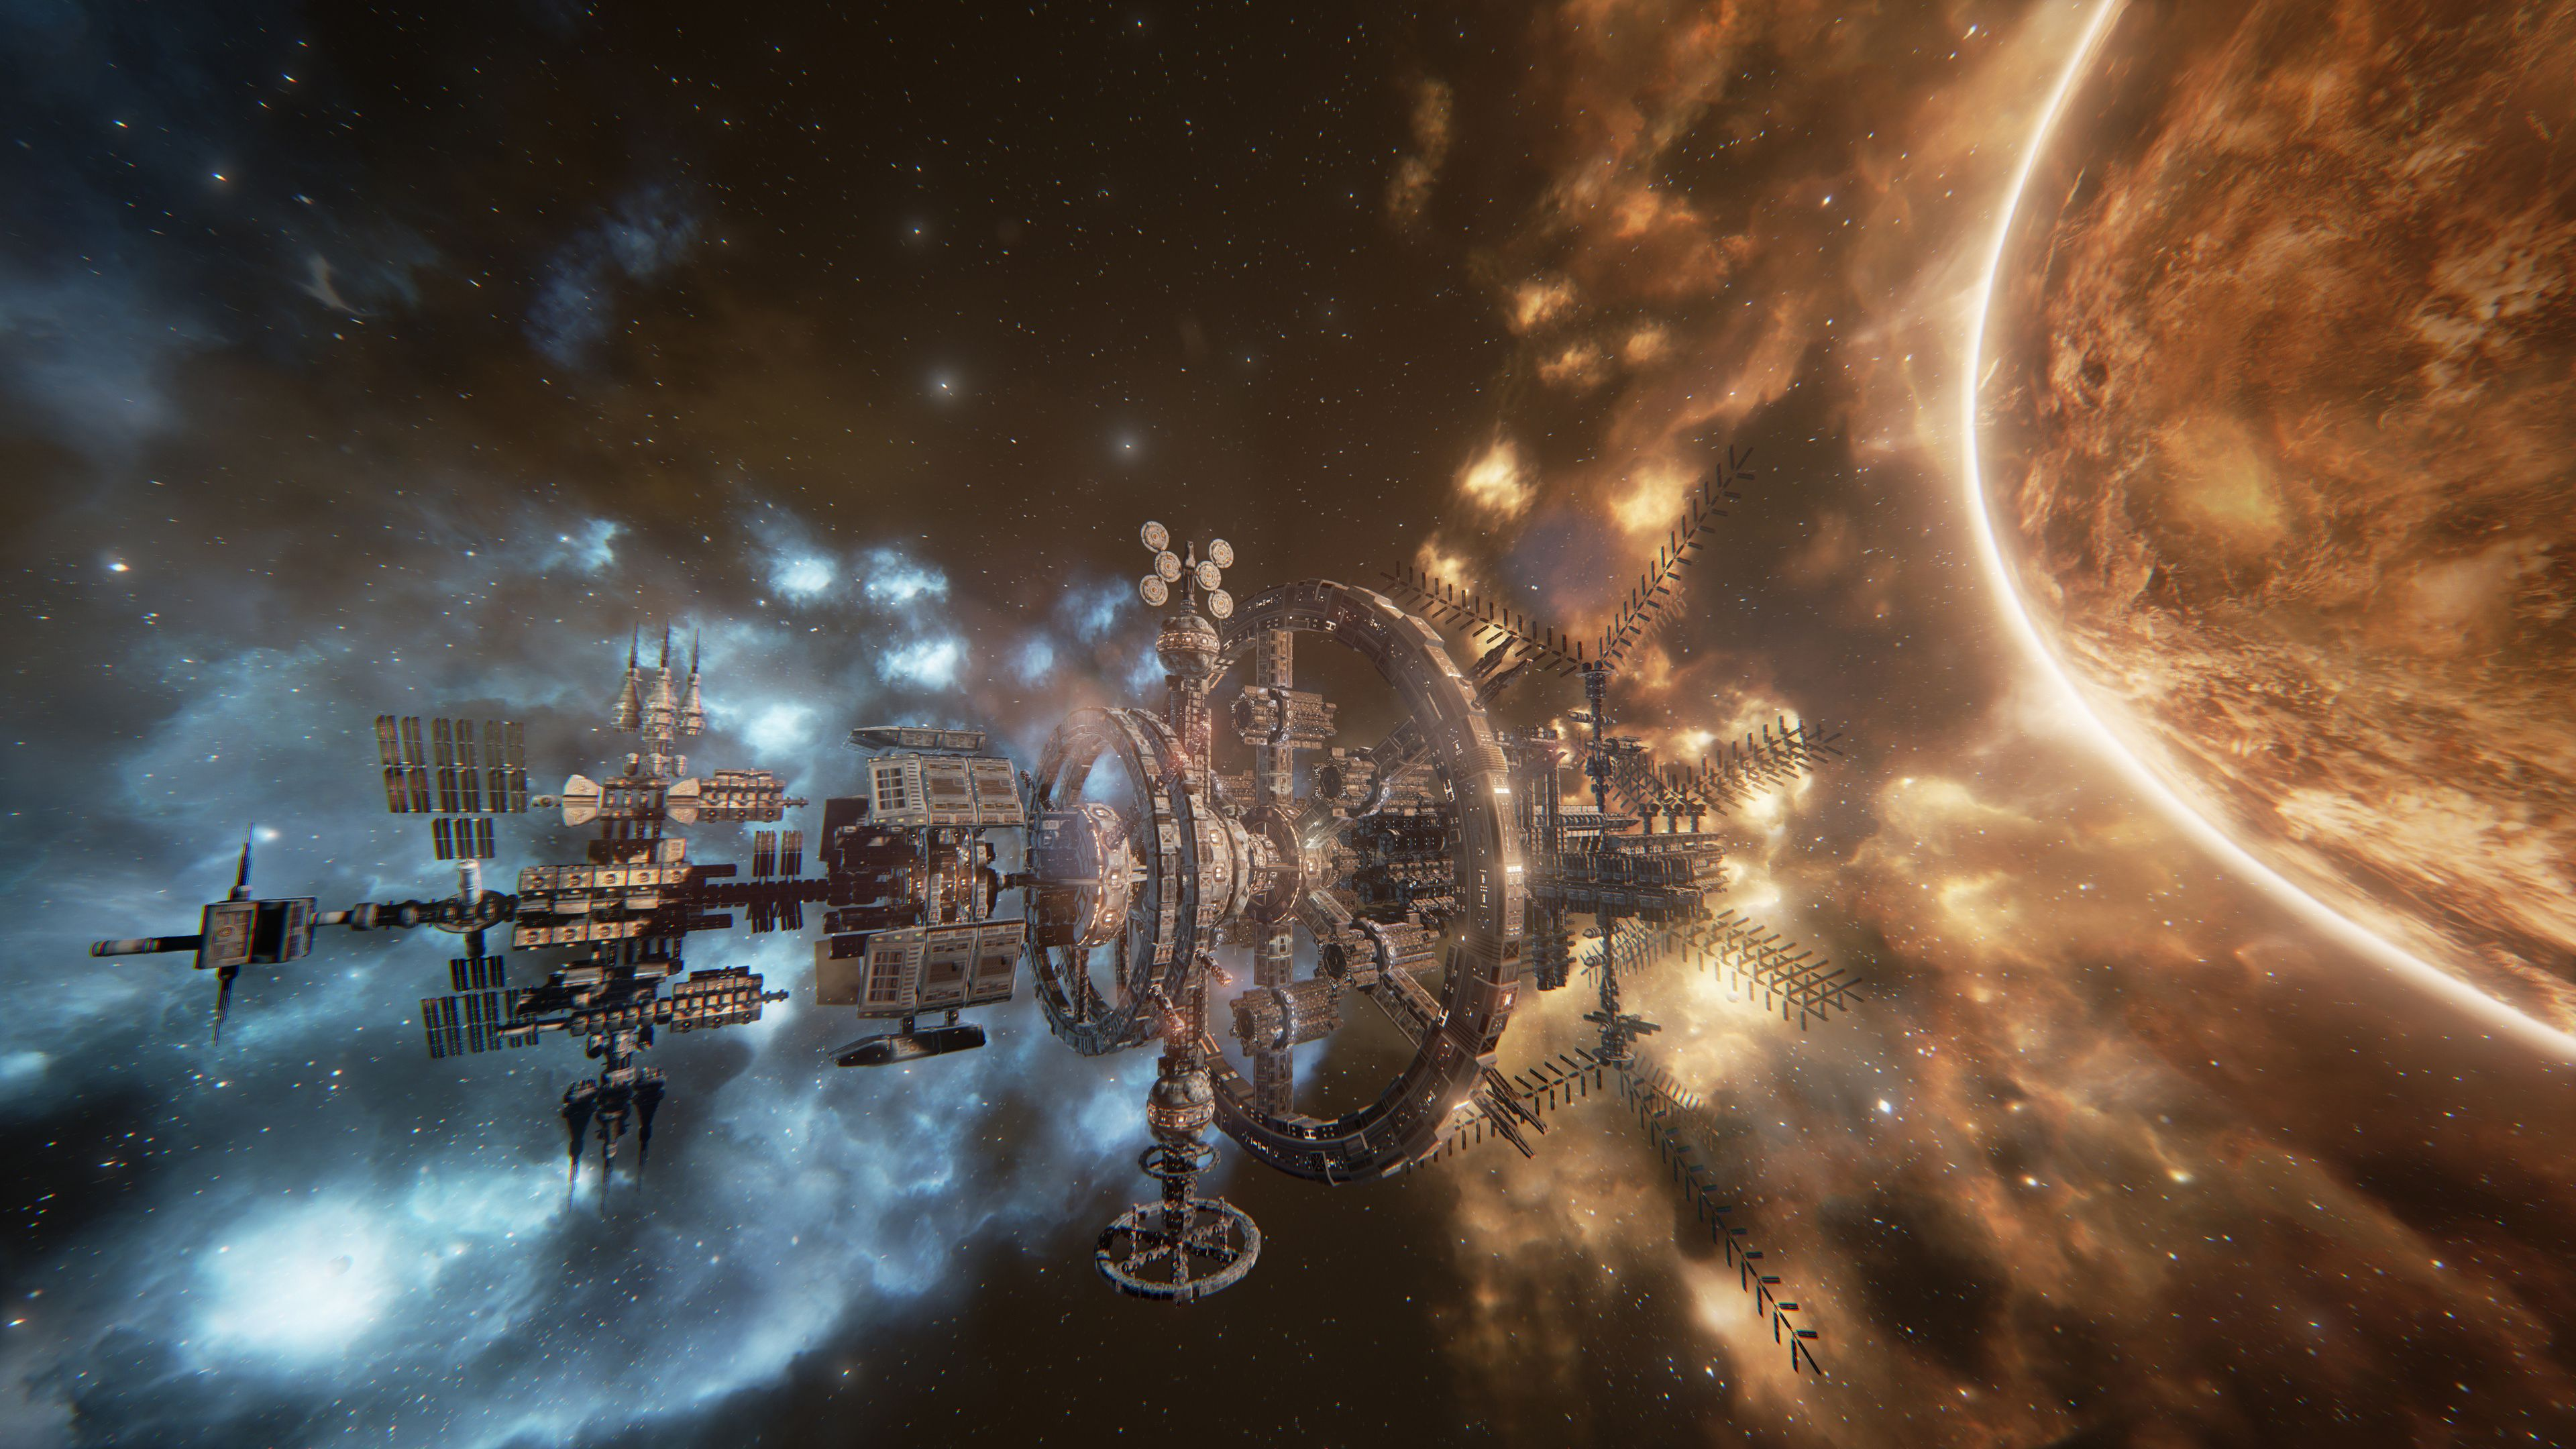 Sci-Fi 4K Wallpapers - Top Free Sci-Fi 4K Backgrounds ...